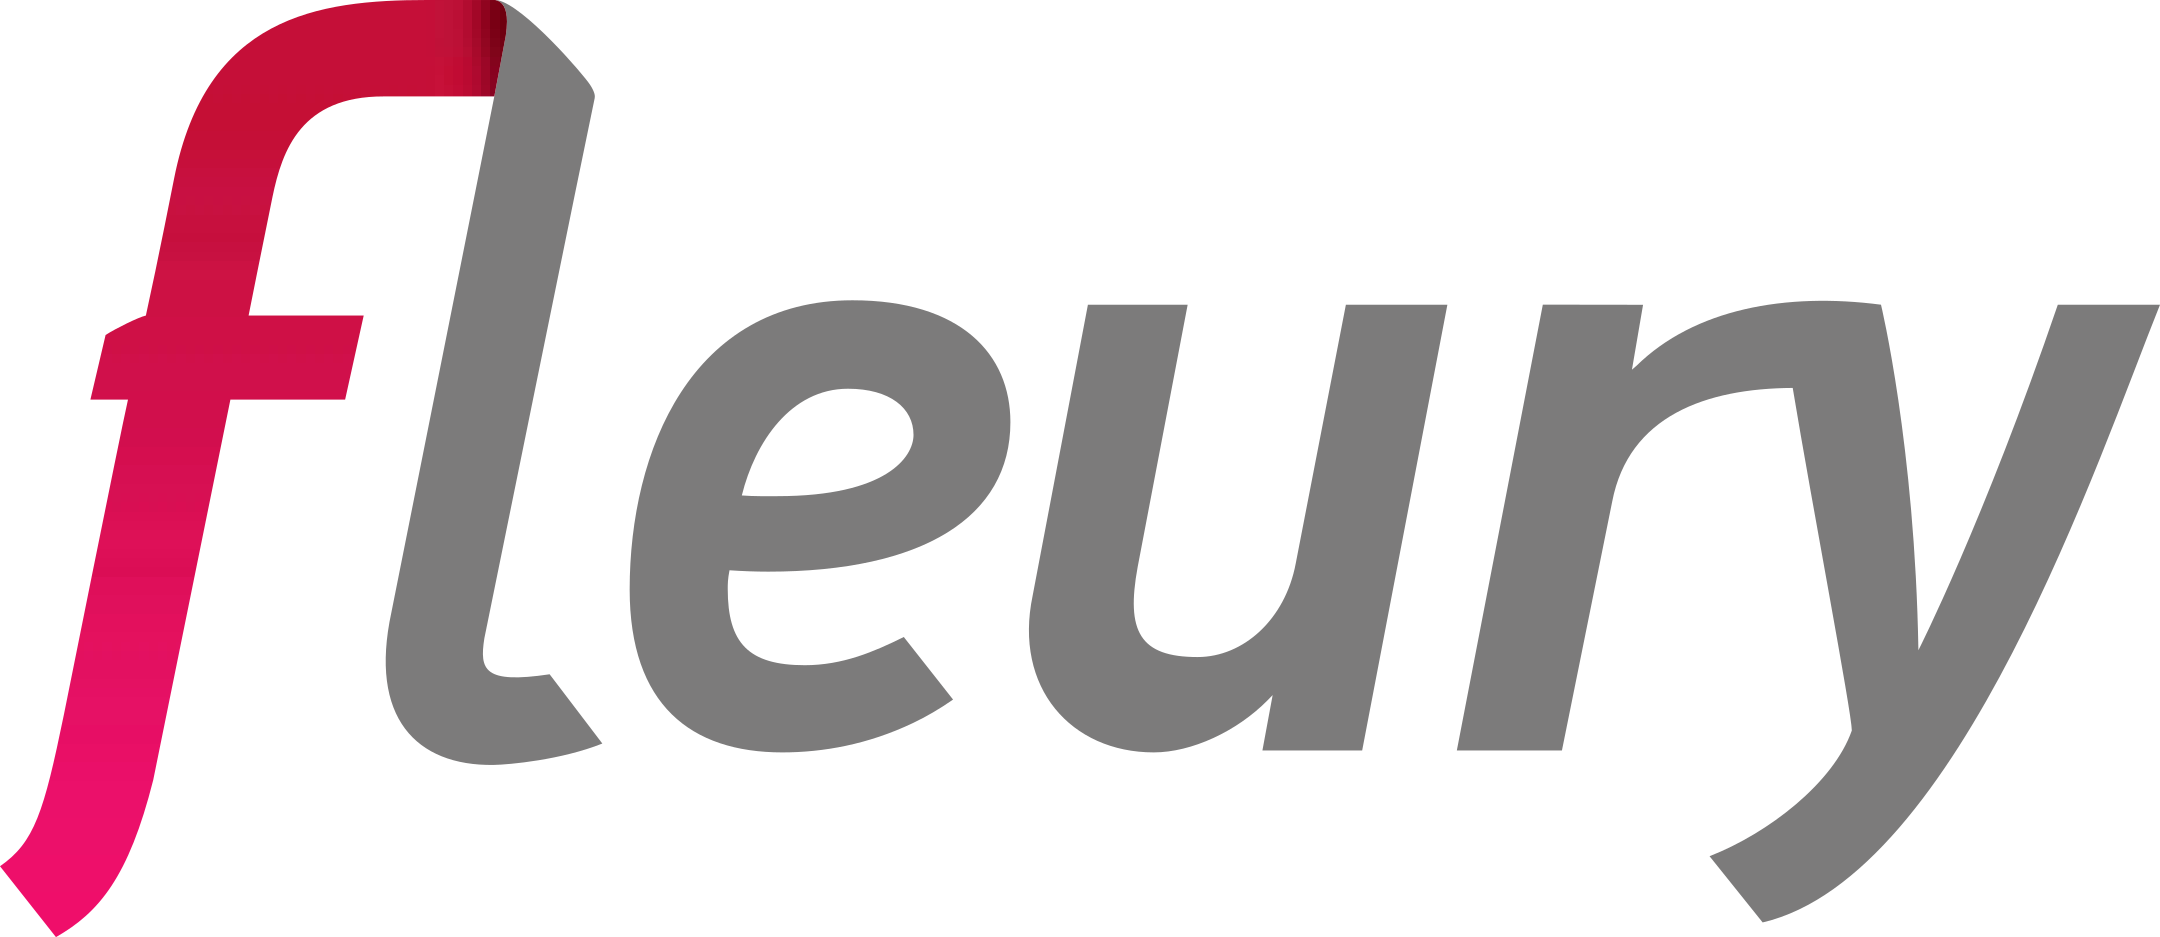 fleury-logo-1